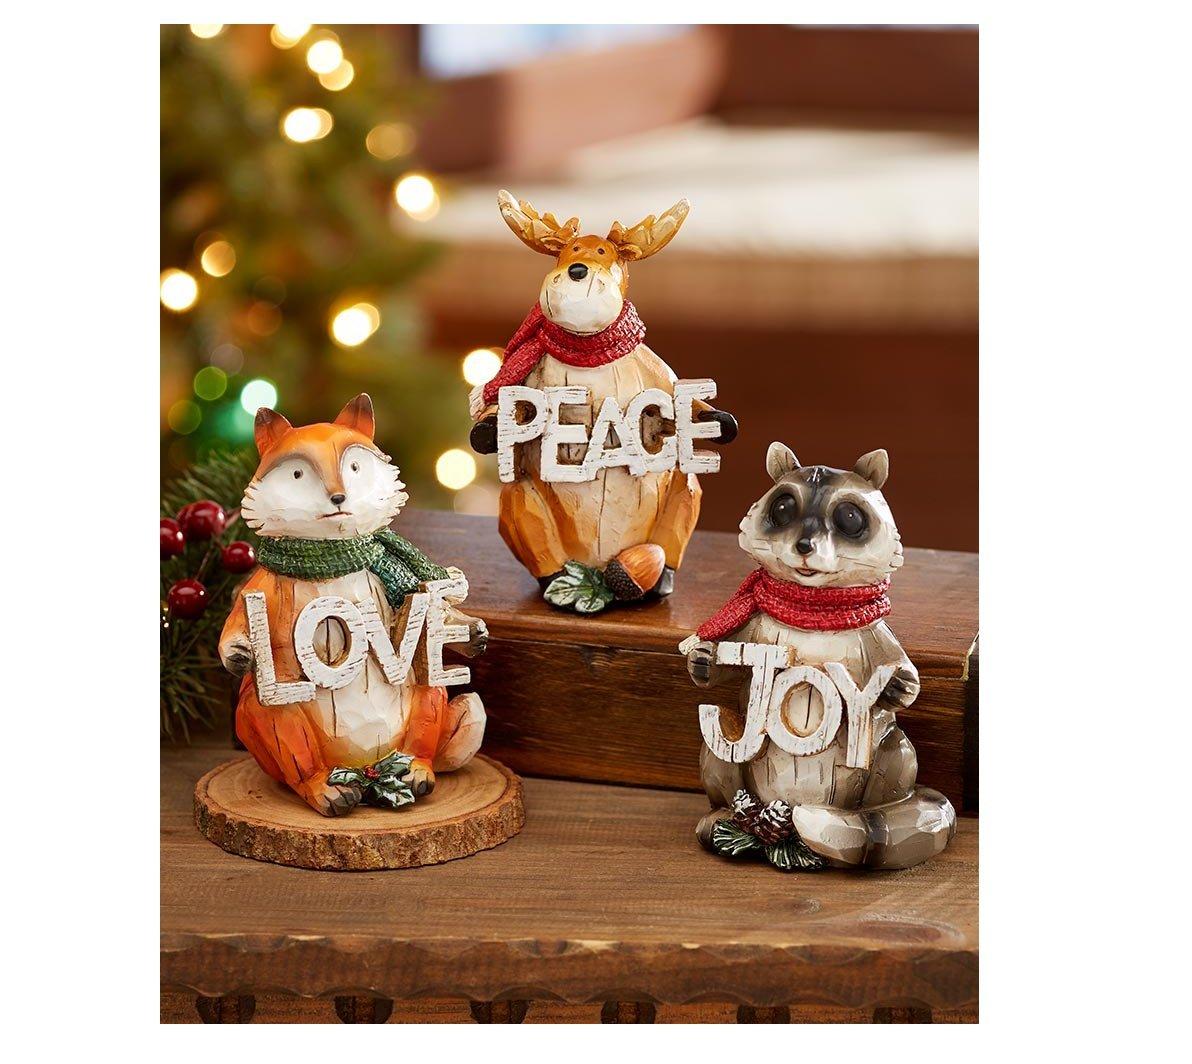 3 Piece Set Holiday Wintery Woodland Animal Figurine Sentiment PEACE LOVE JOY Home Decor